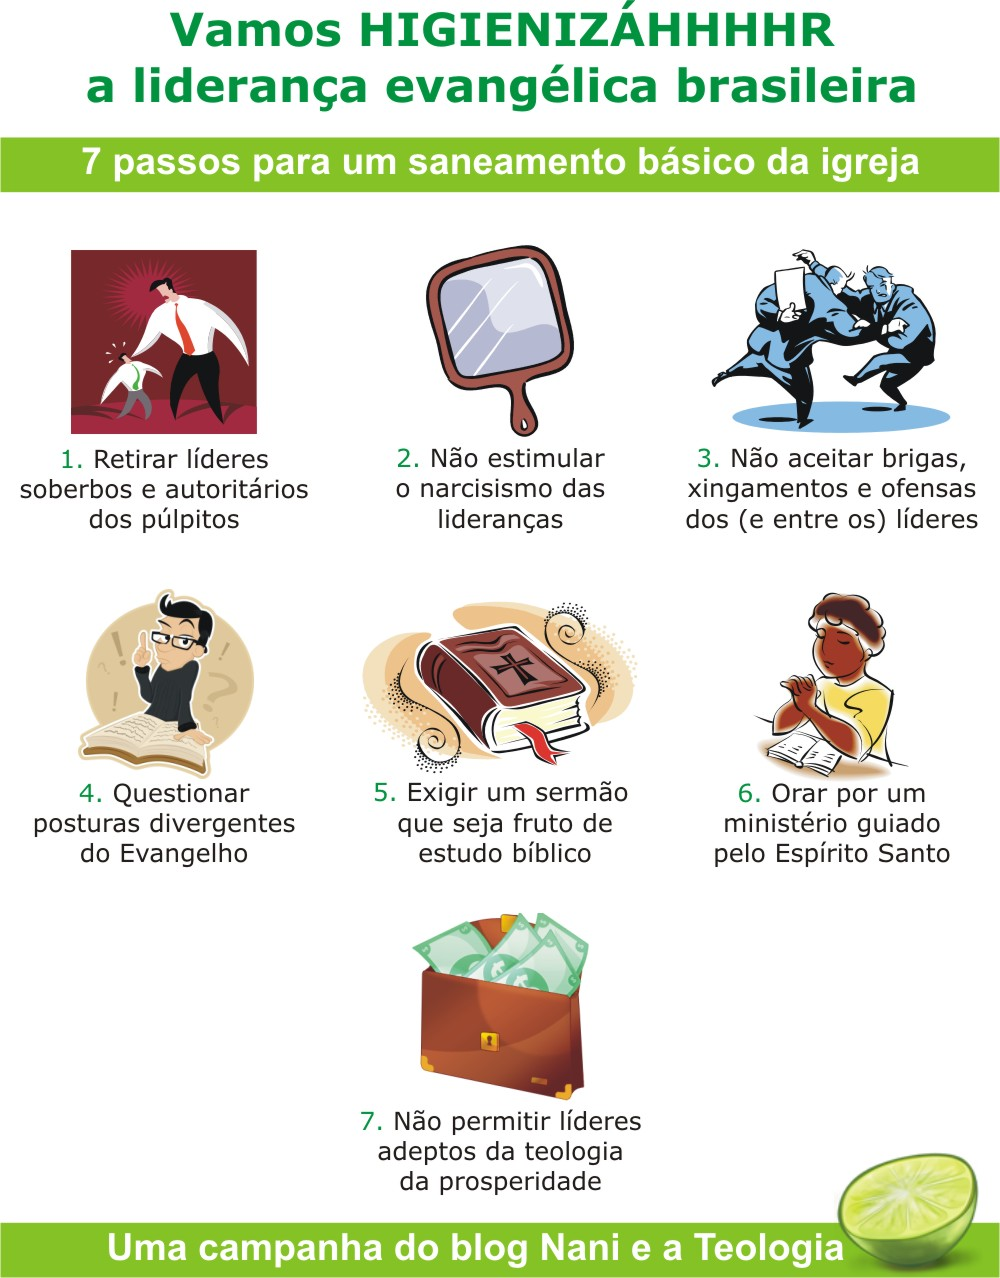 higienizar Vamos HIGIENIZÁHHHHR a liderança evangélica brasileira!